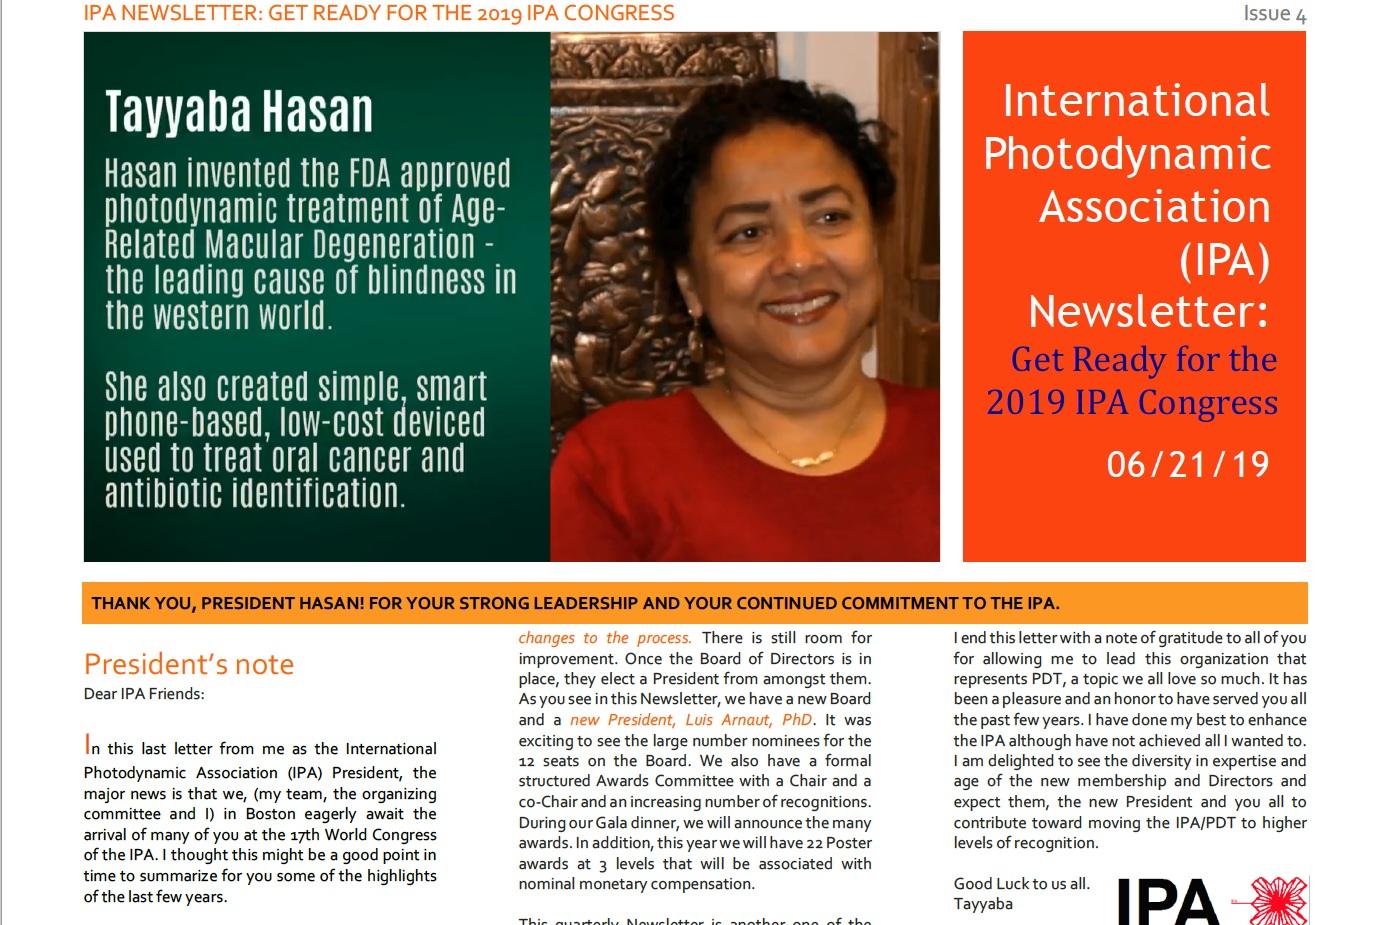 IPA+Newsletter+Issue+4.jpg